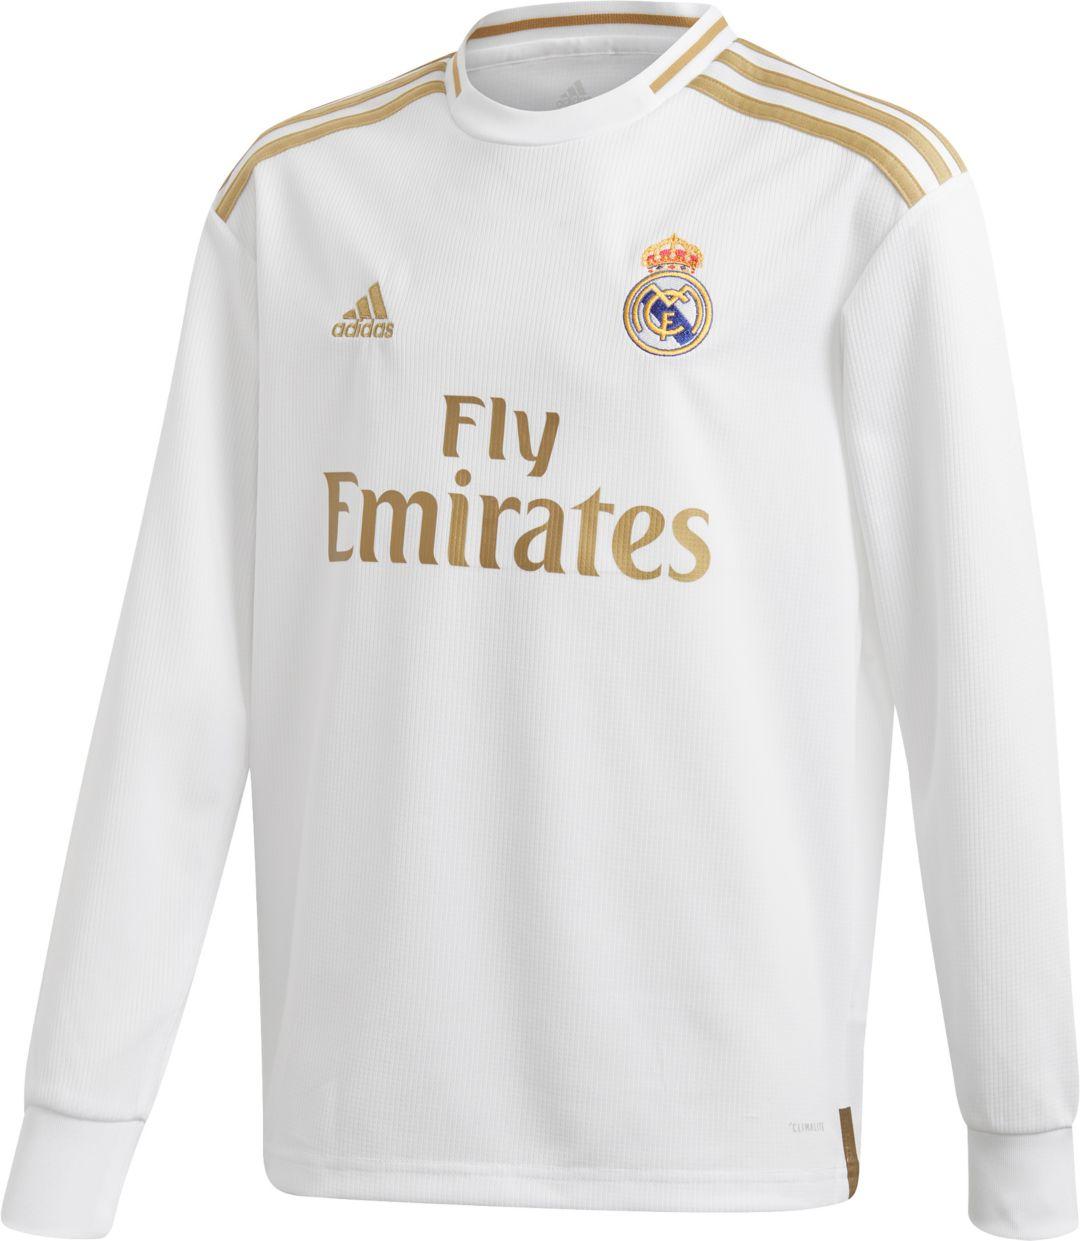 sale retailer 3cd6e 80897 adidas Youth Real Madrid '19 Stadium Home Replica Long Sleeve Jersey